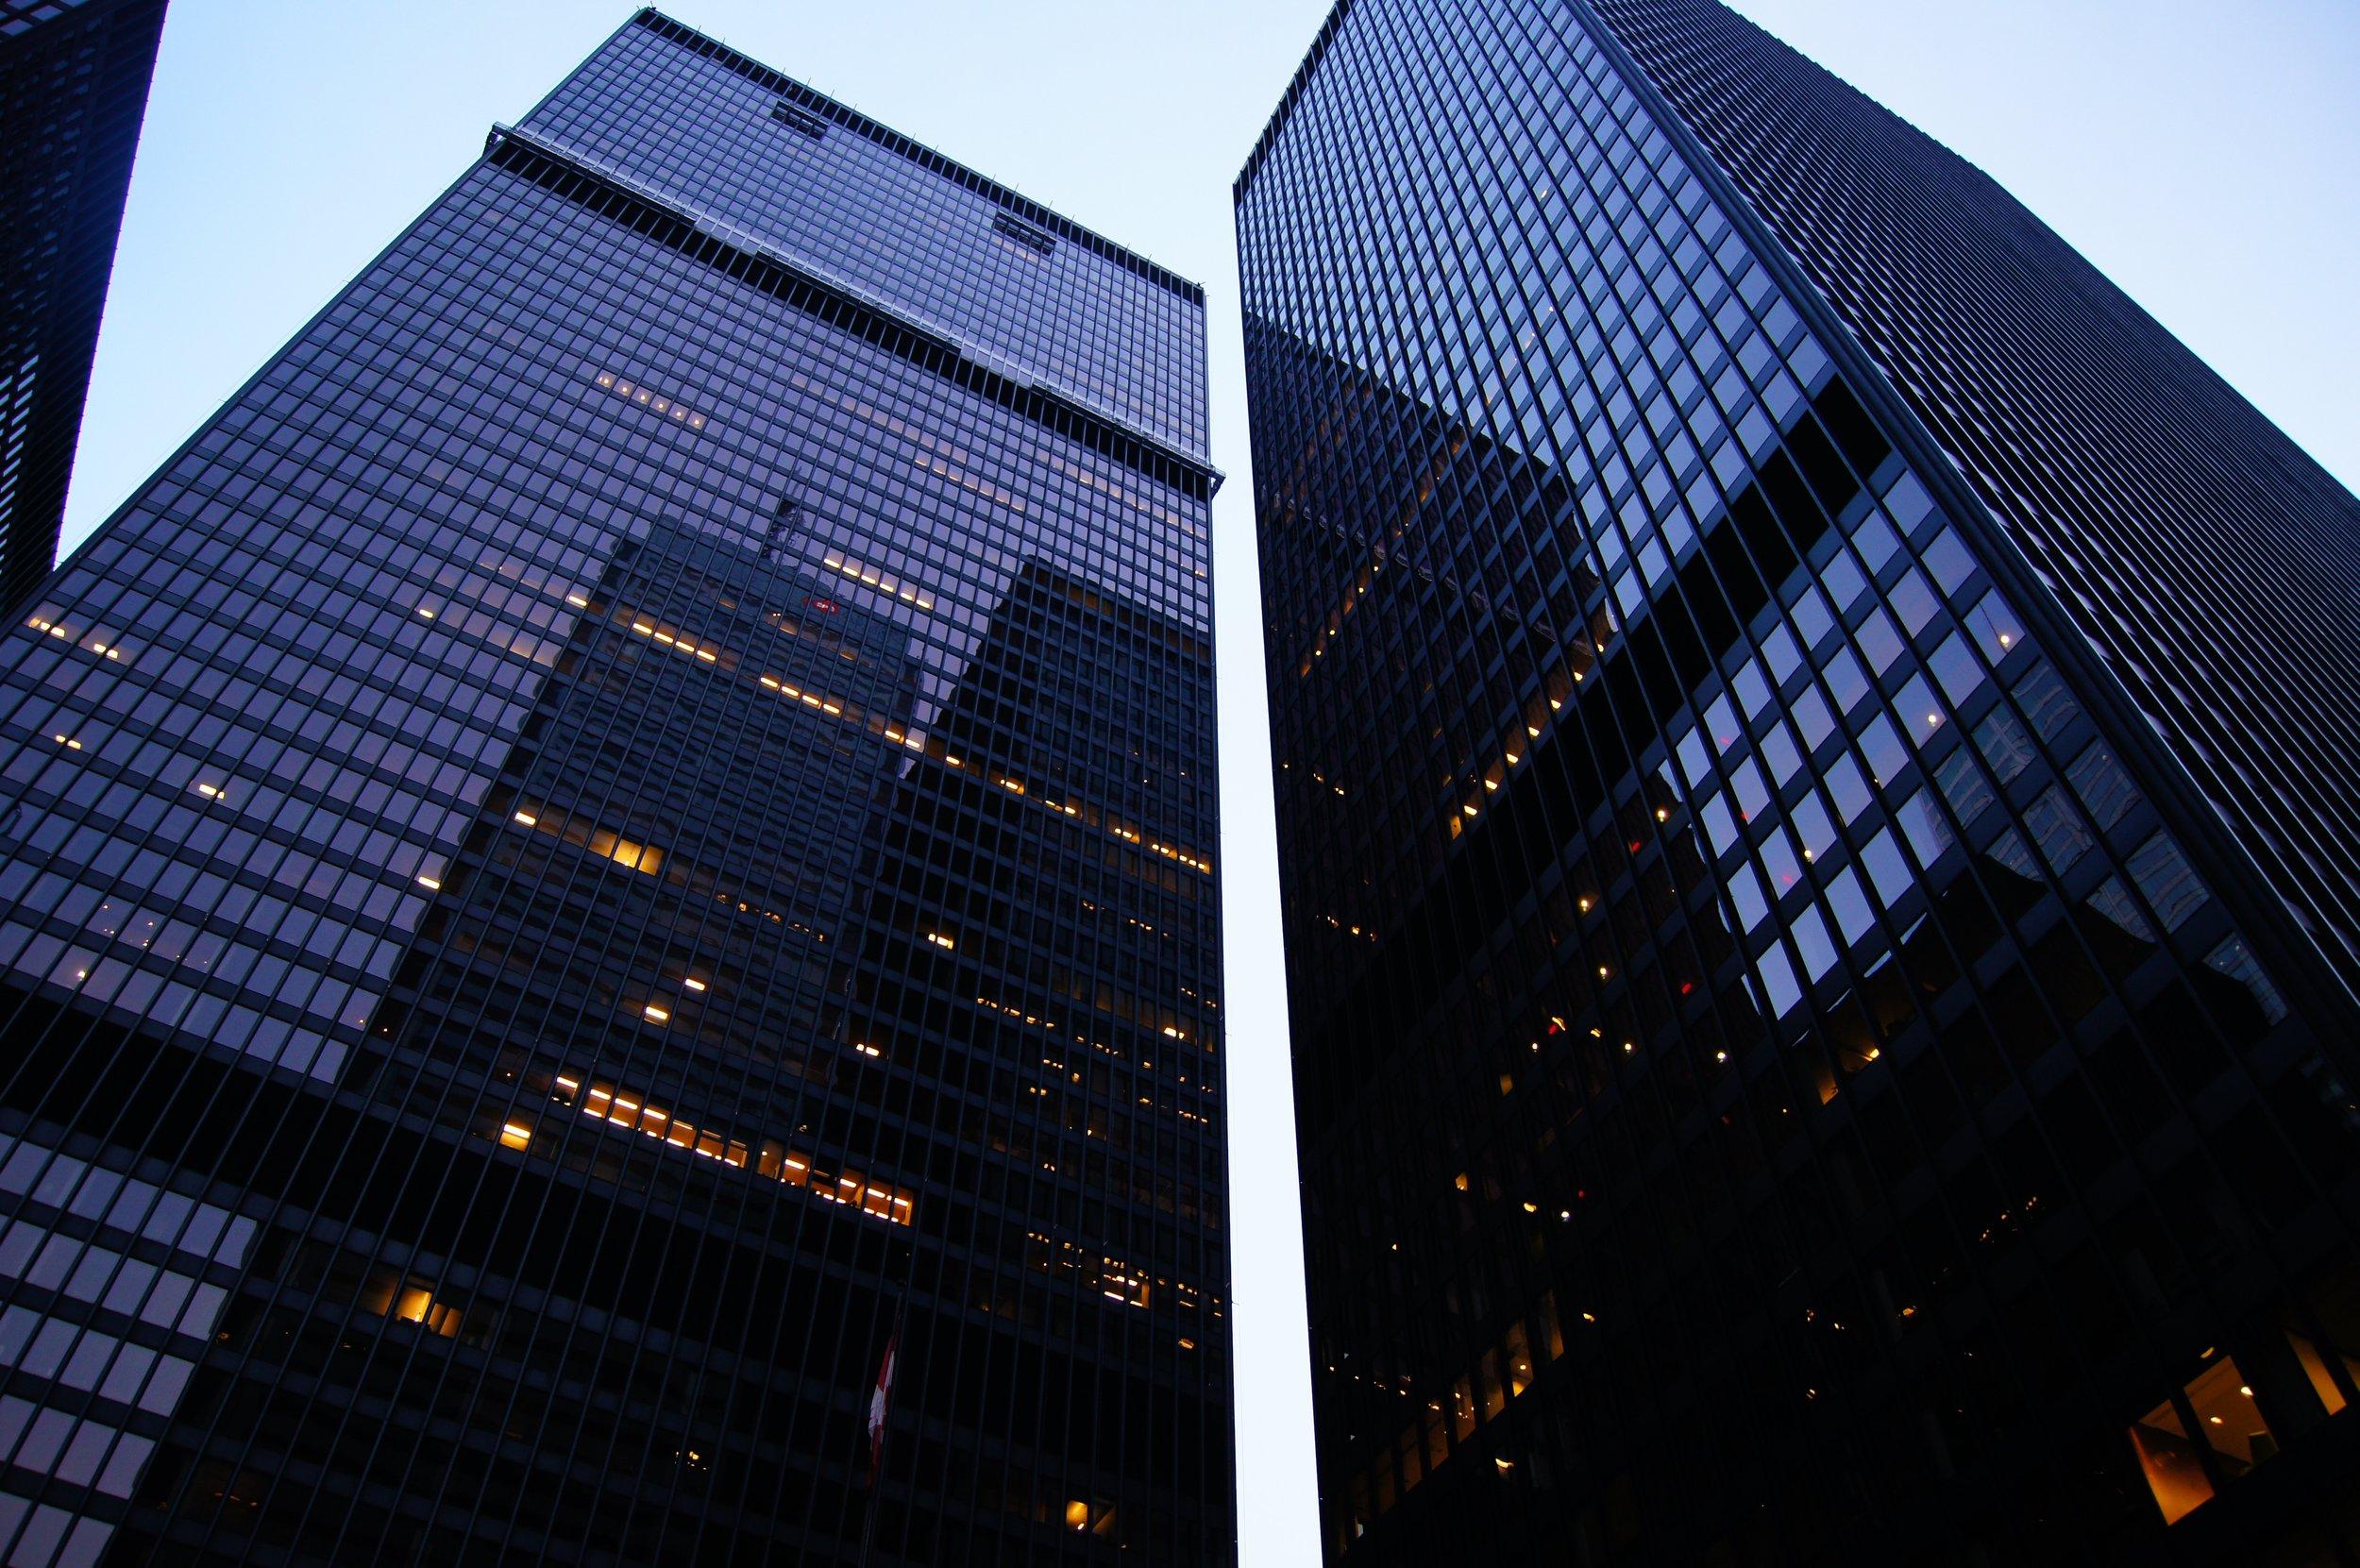 architecture-buildings-company-233698.jpg